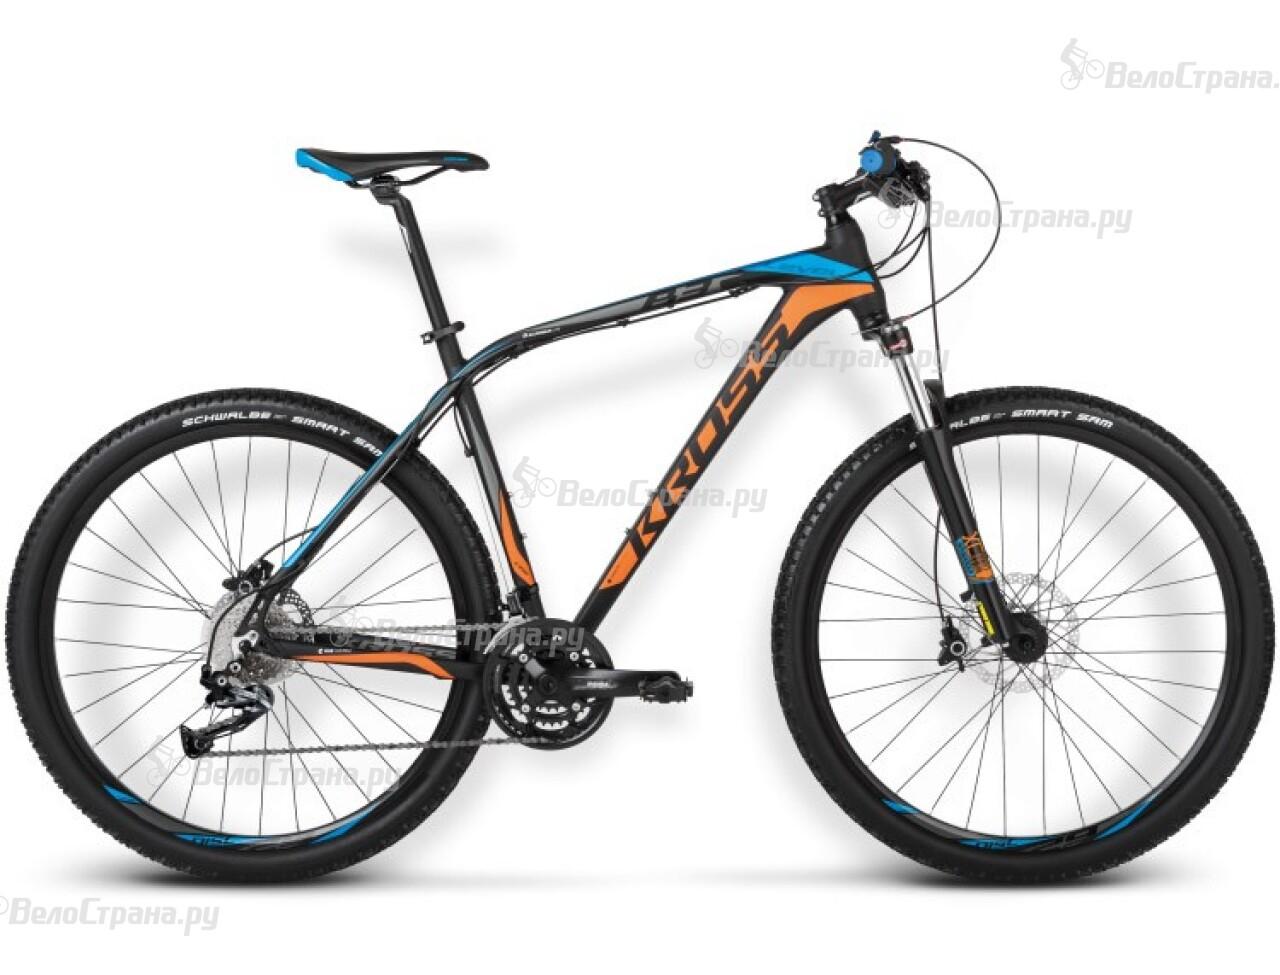 купить Велосипед Kross LEVEL B3 (2015) недорого